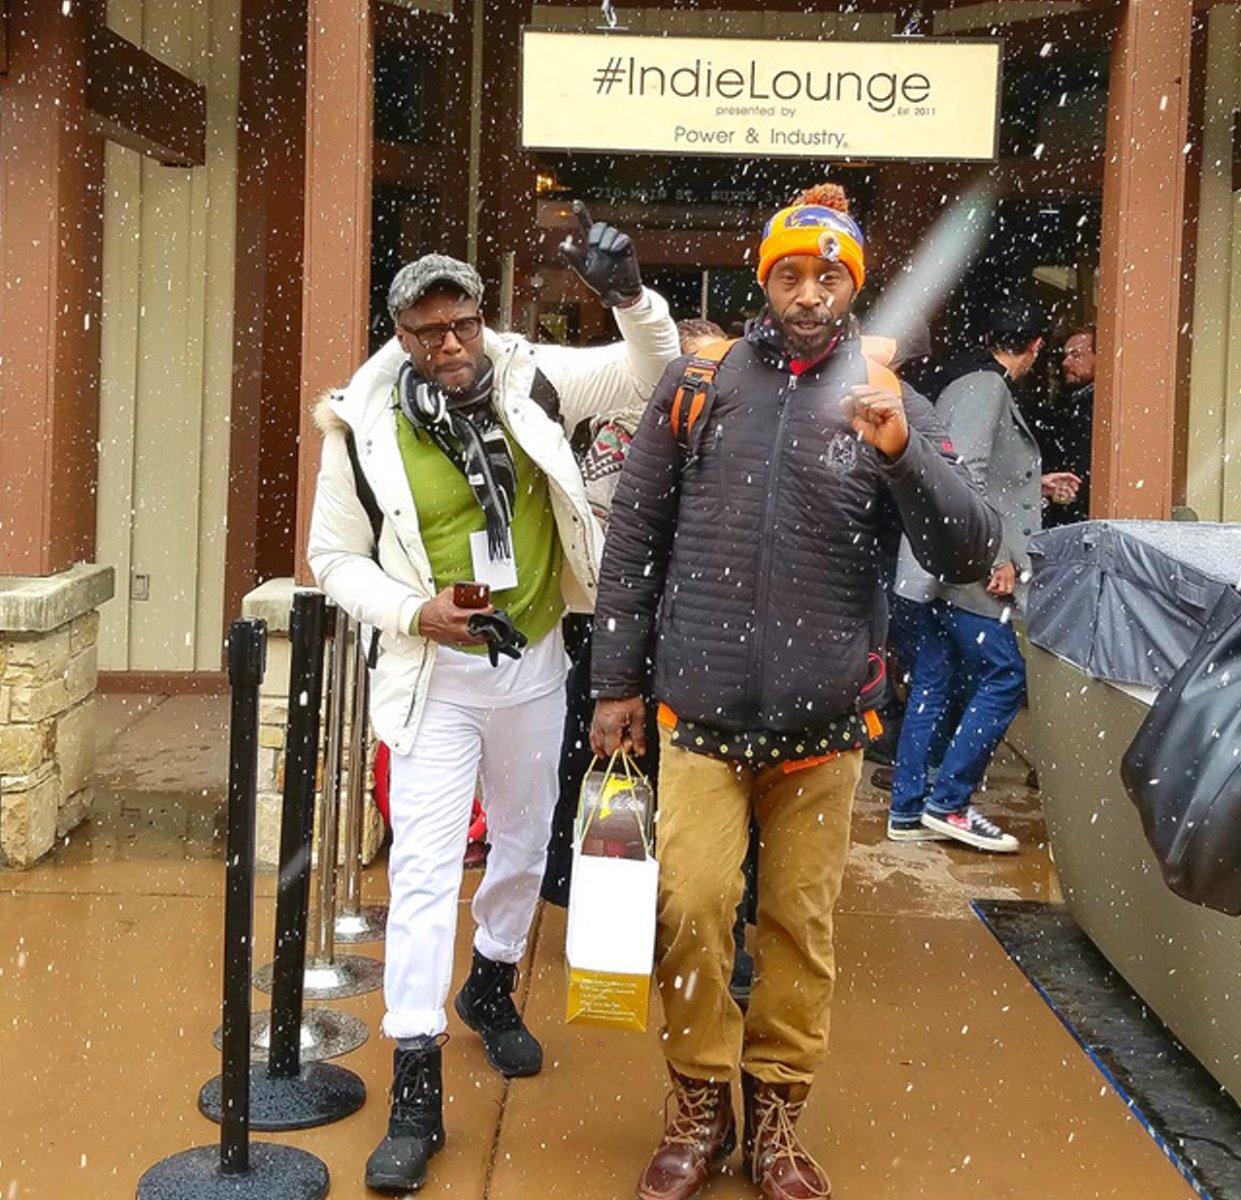 indie lounge sundance 2017 wrap mally mall john singleton shar jackson lil nate dogg sunofhollywood 03